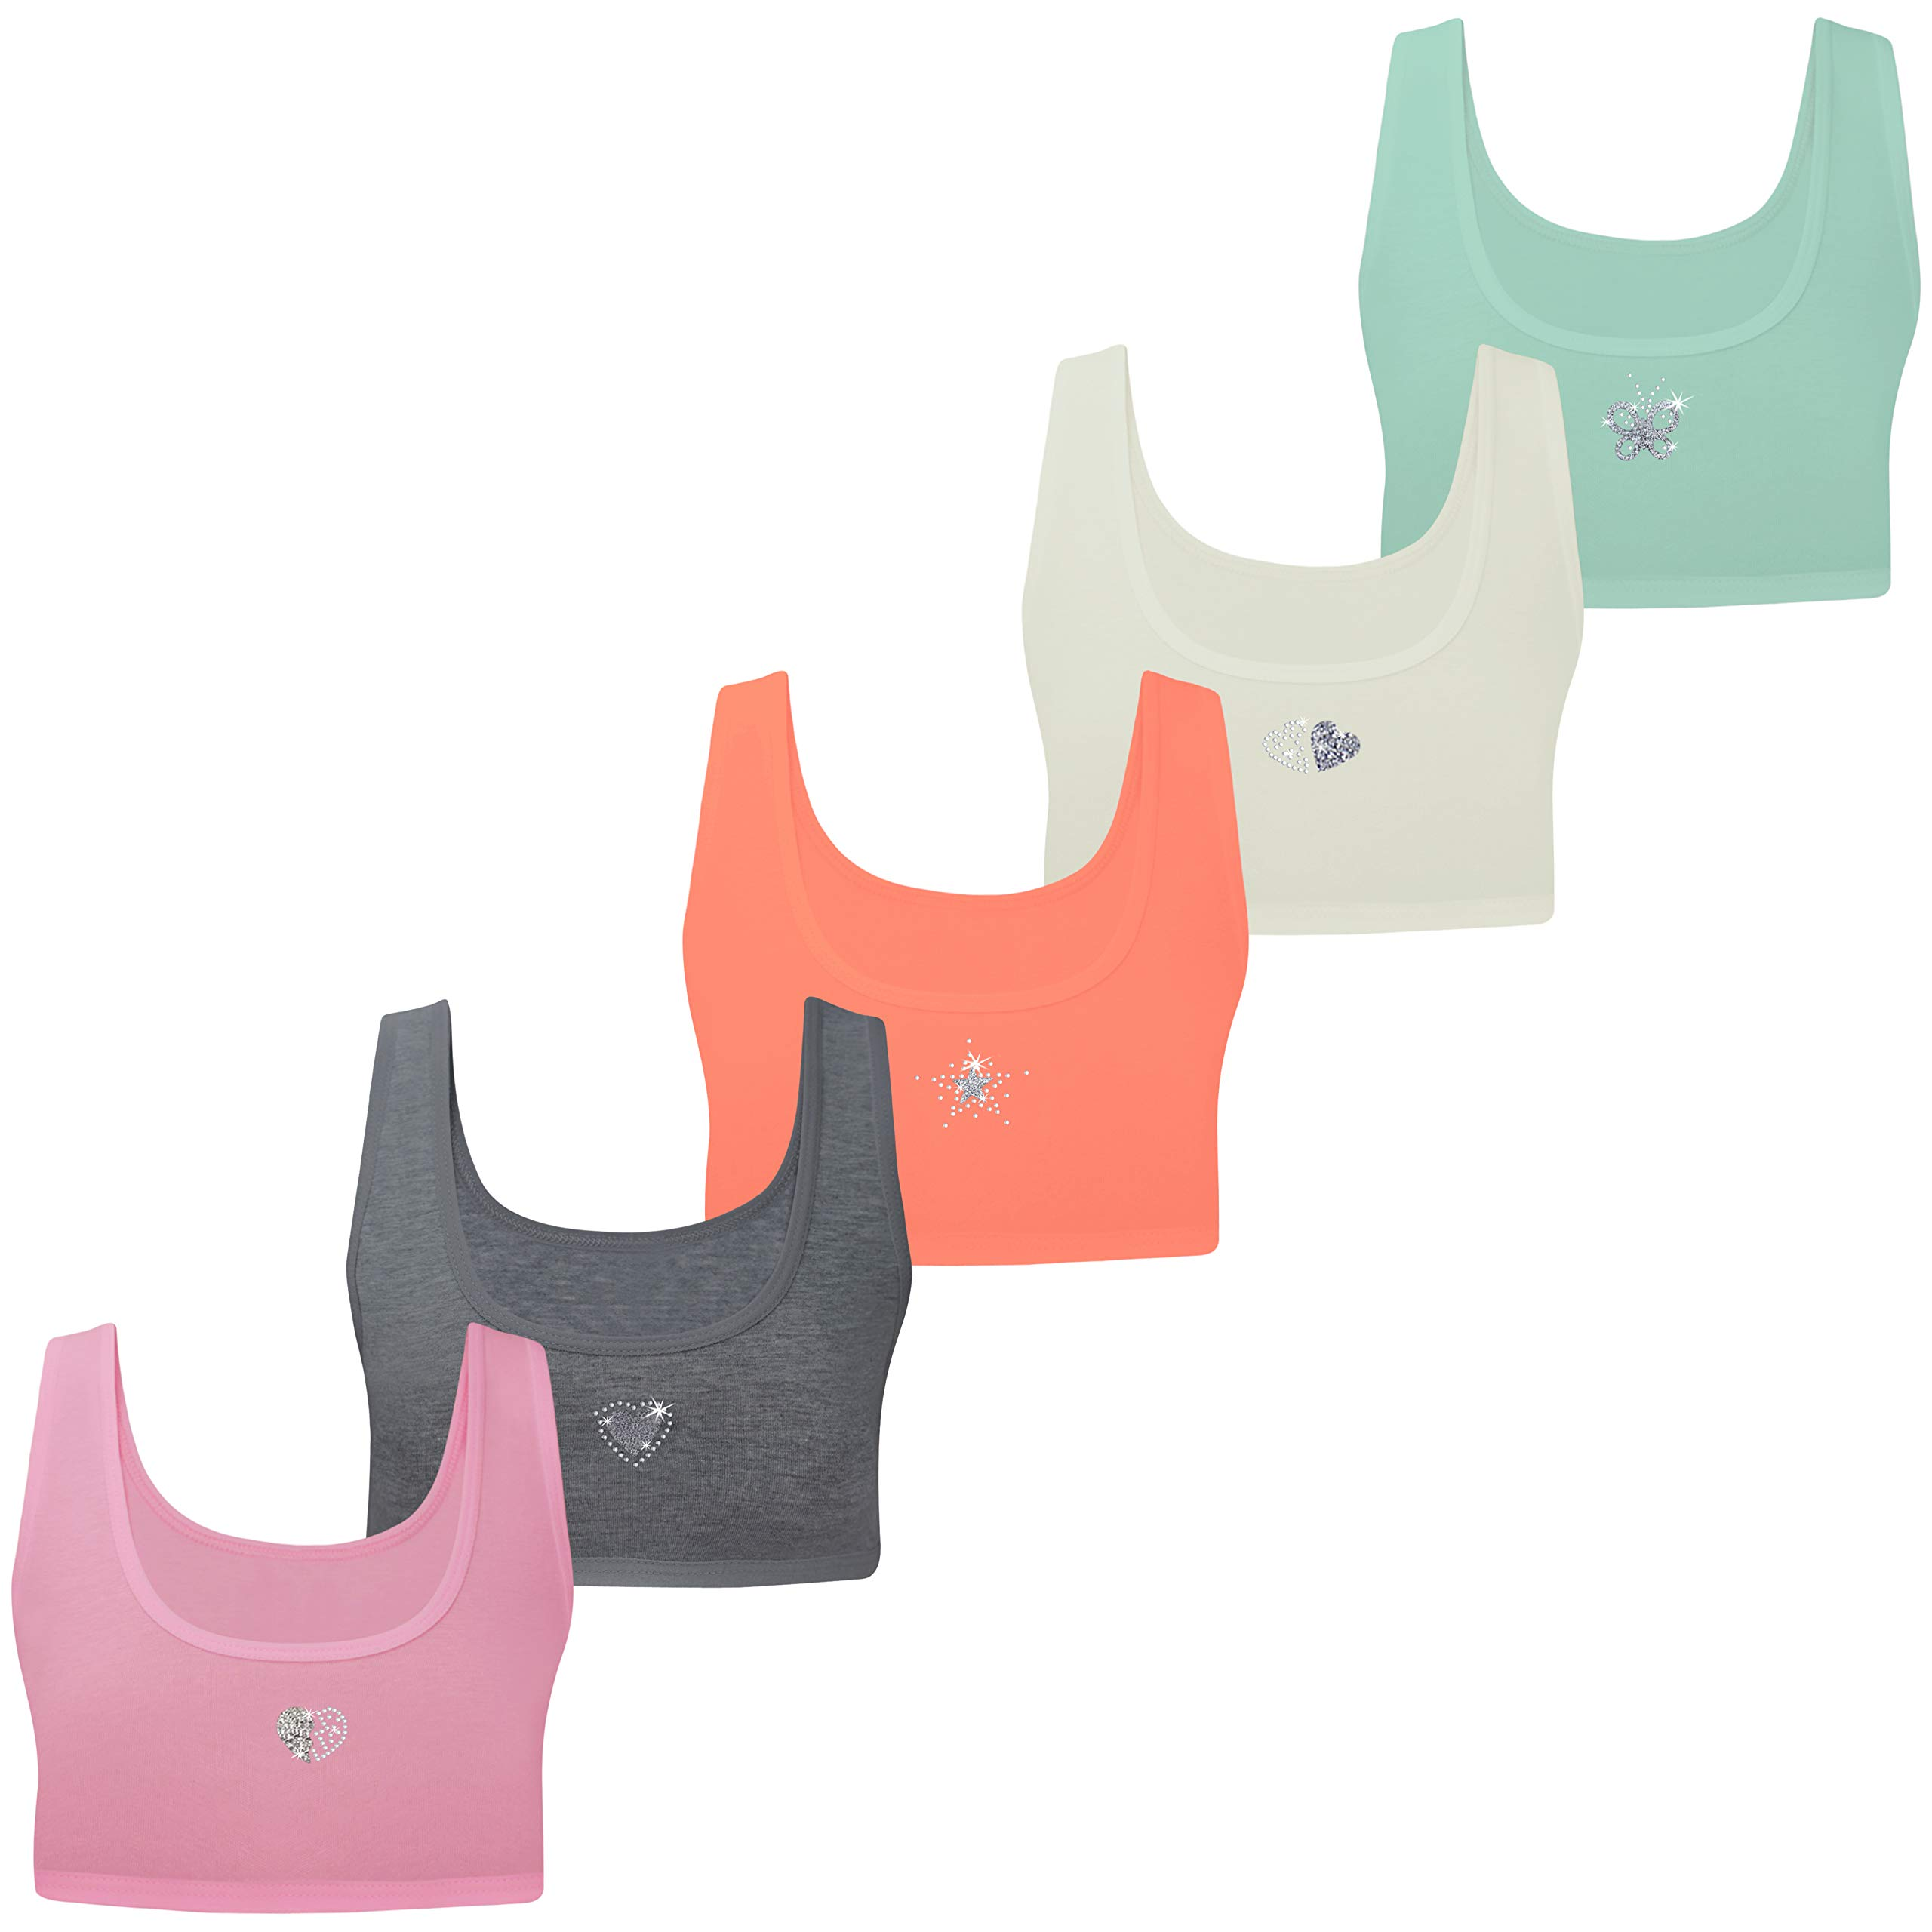 Girls Sports Bras Pack of 5 Cotton Diamante Glitter Strappy Top